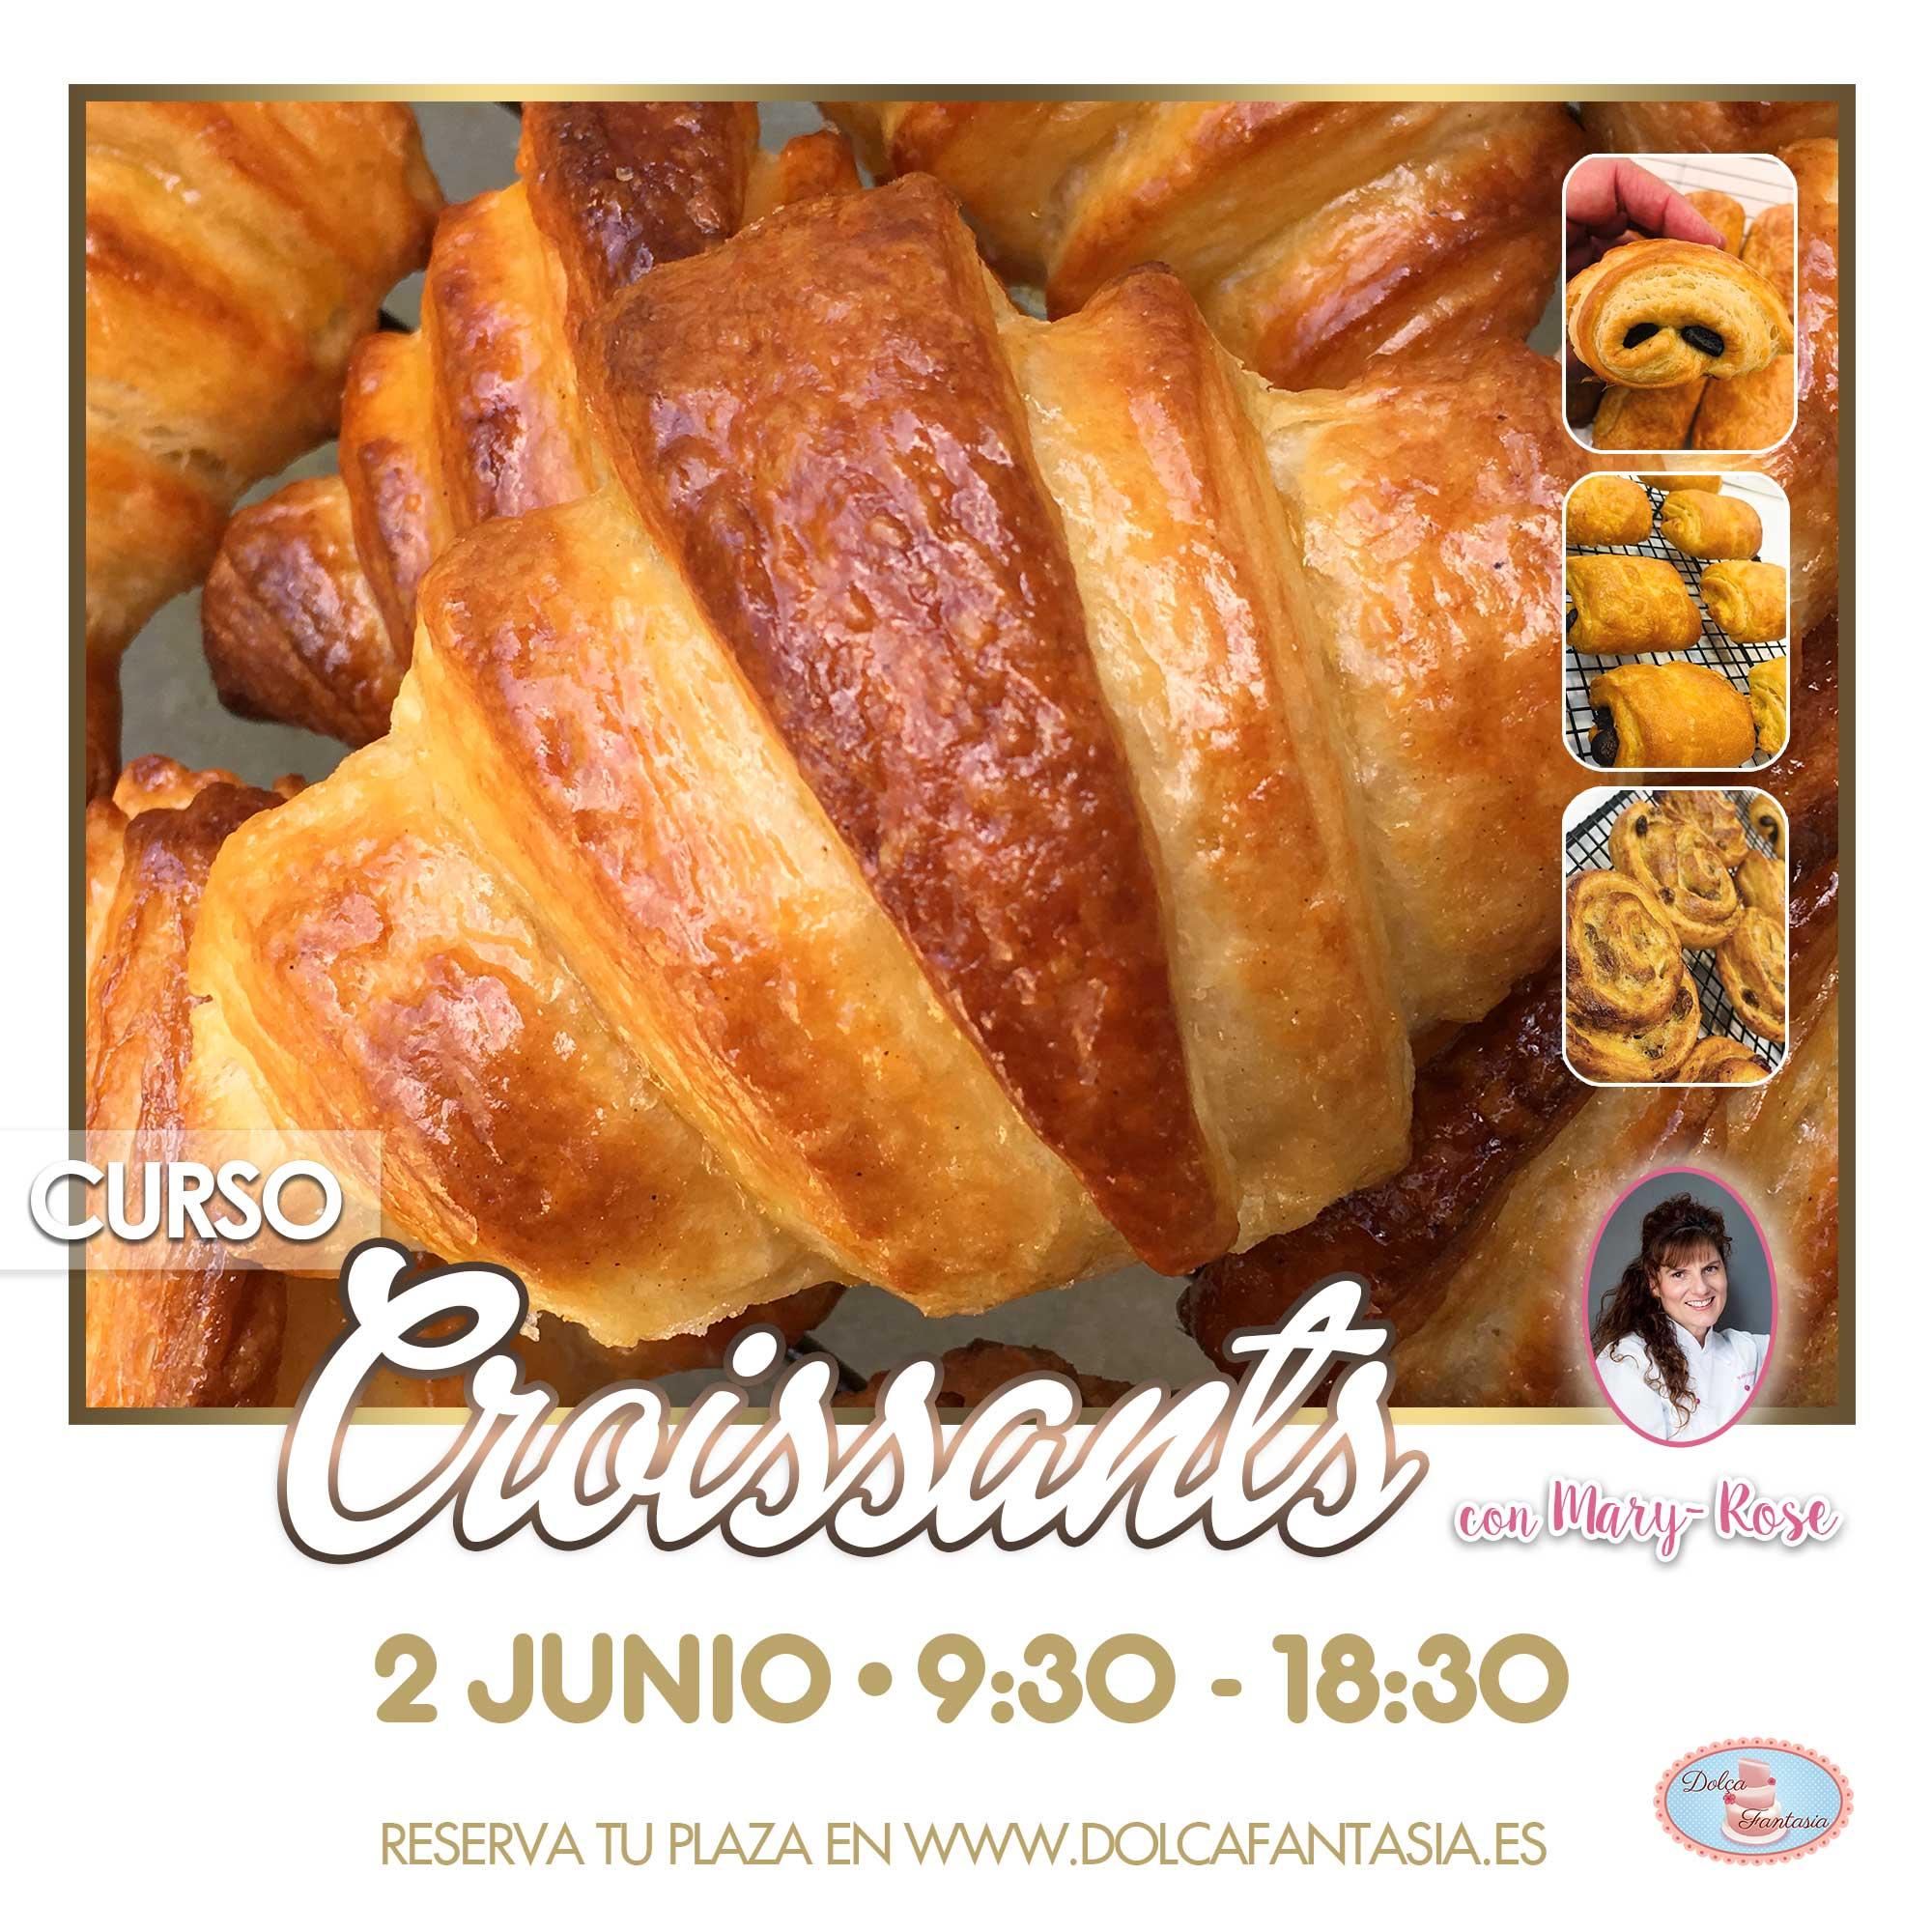 Curso Croissants con Mary Rose